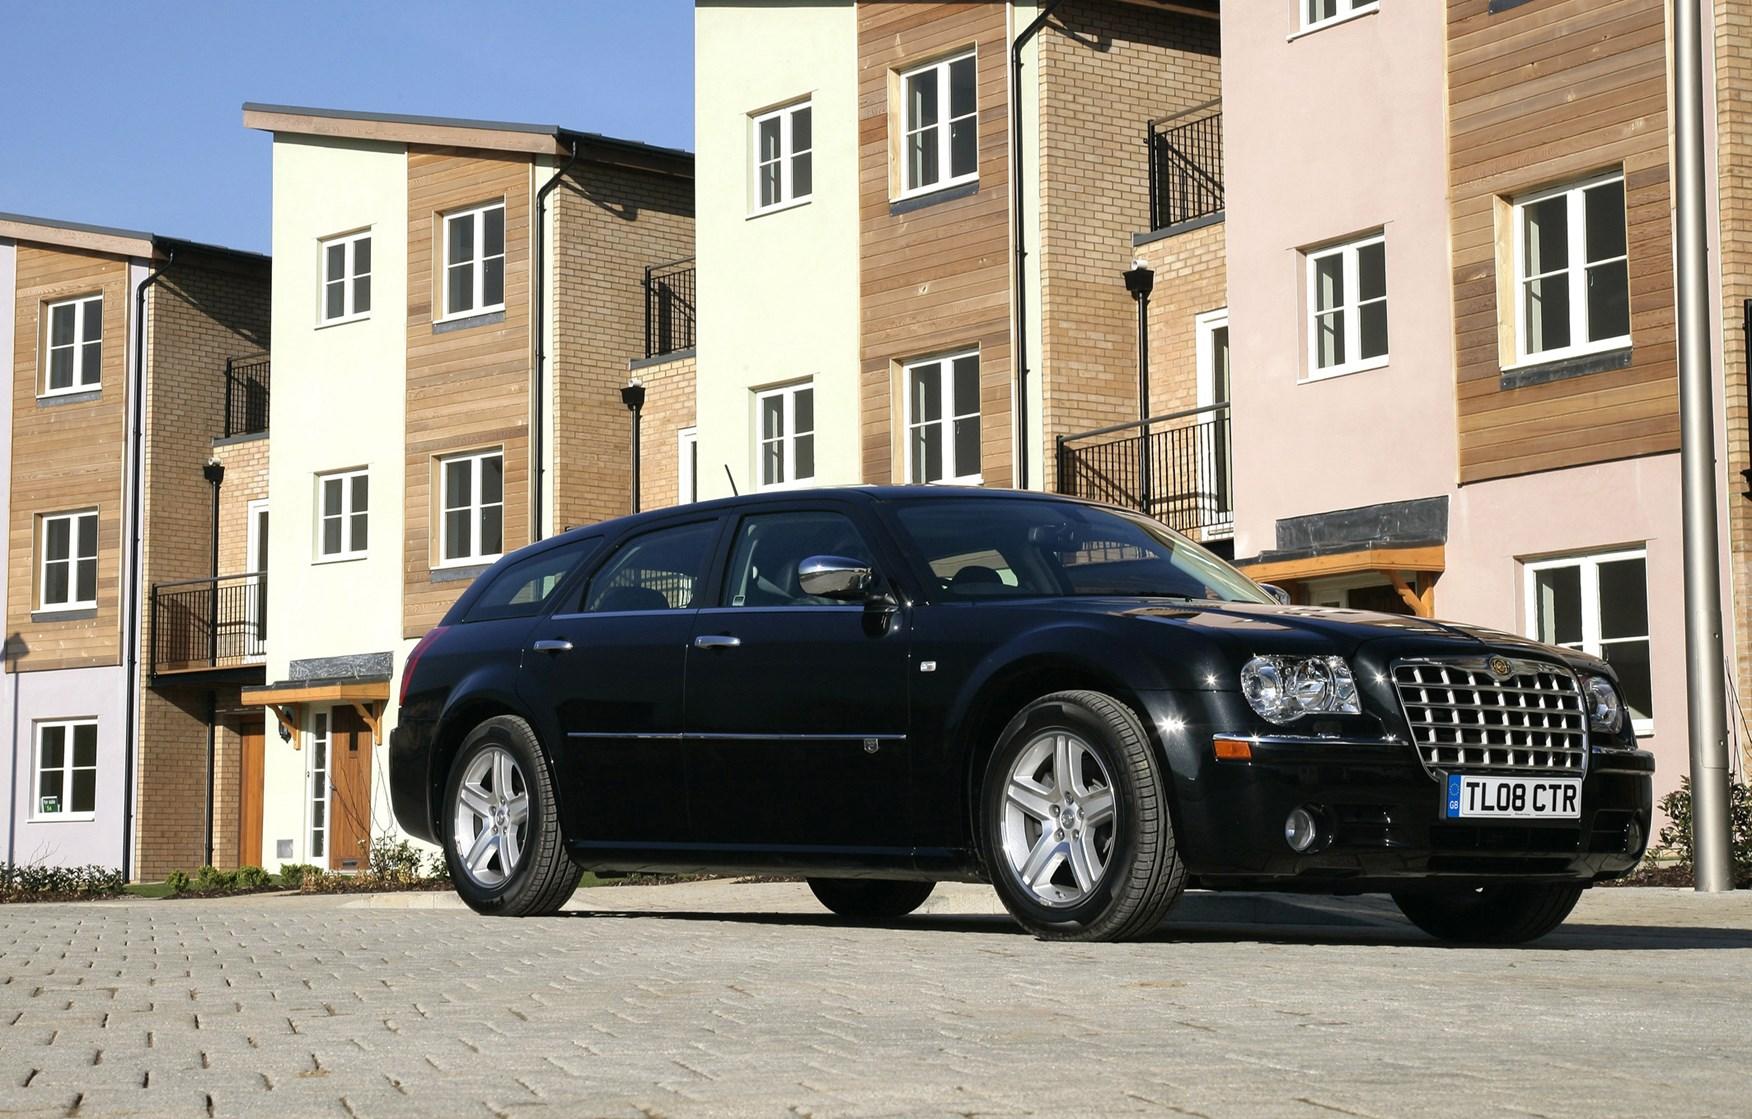 page 2 chrysler 300c saloon 2005 owner review car autos post. Black Bedroom Furniture Sets. Home Design Ideas